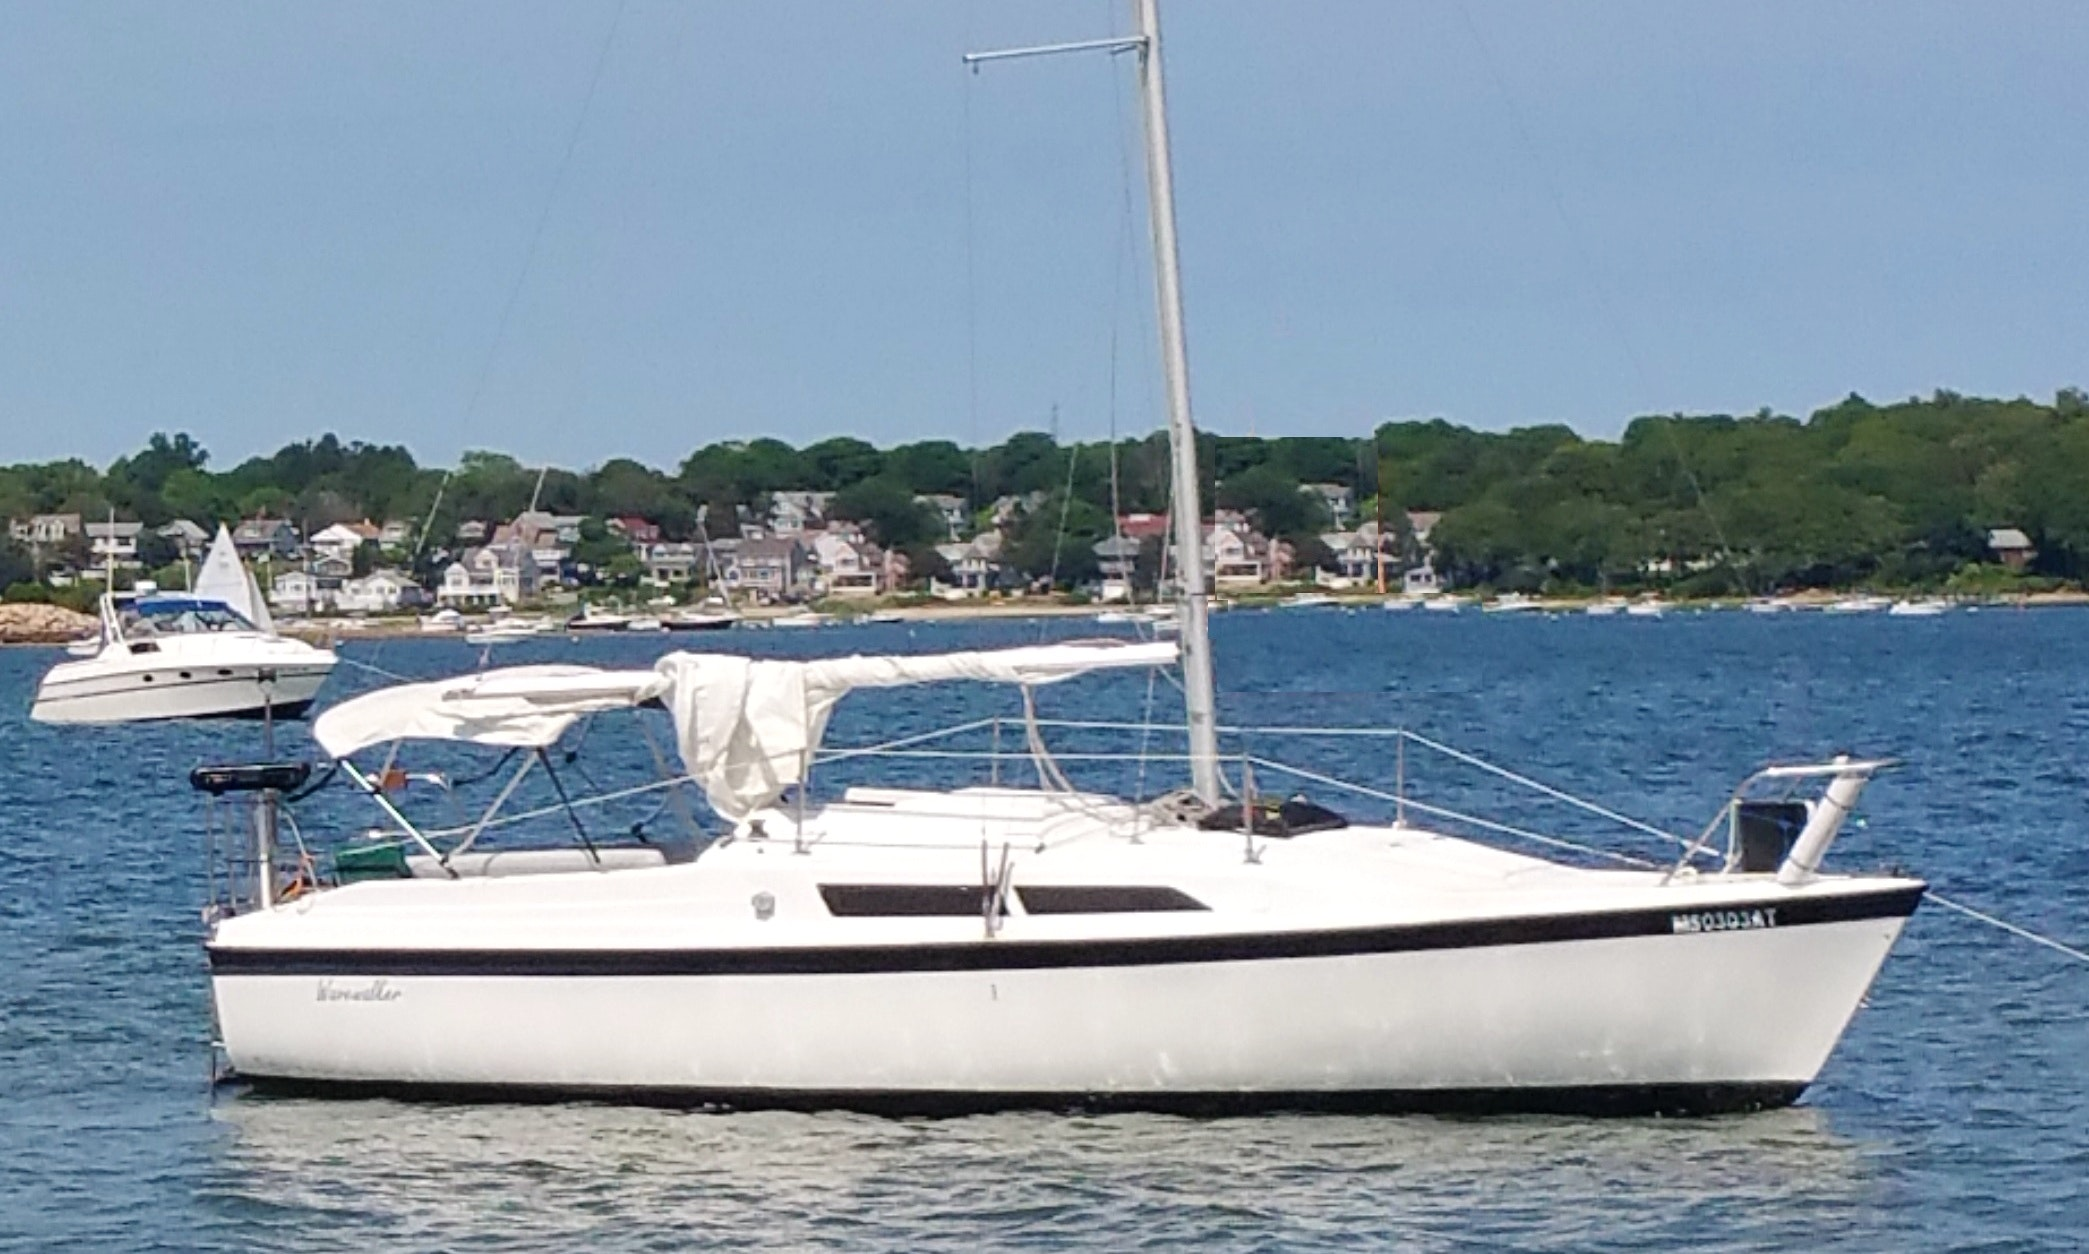 boat-rentals-framingham-massachusetts-macgregor-26s-processed Sailboat Rental Cape Cod